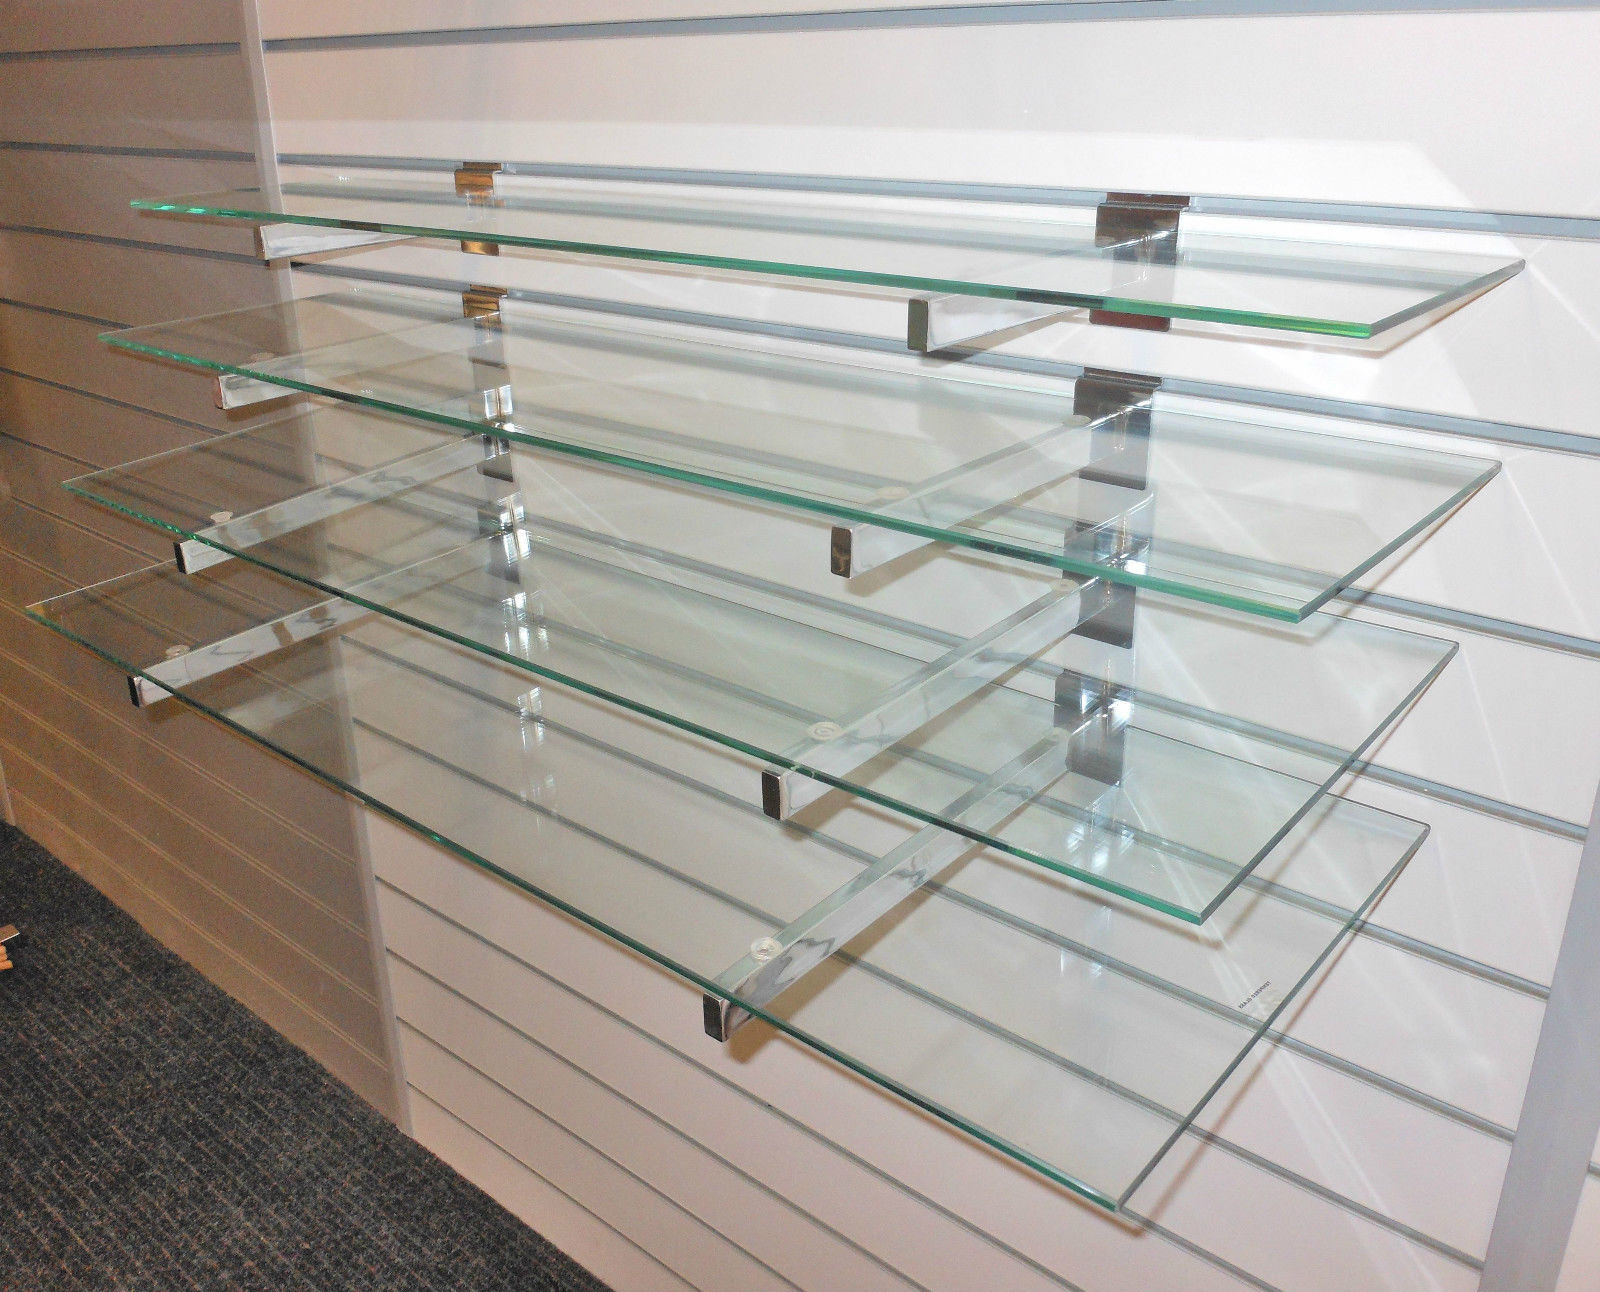 4 Toughened Glass Shelves